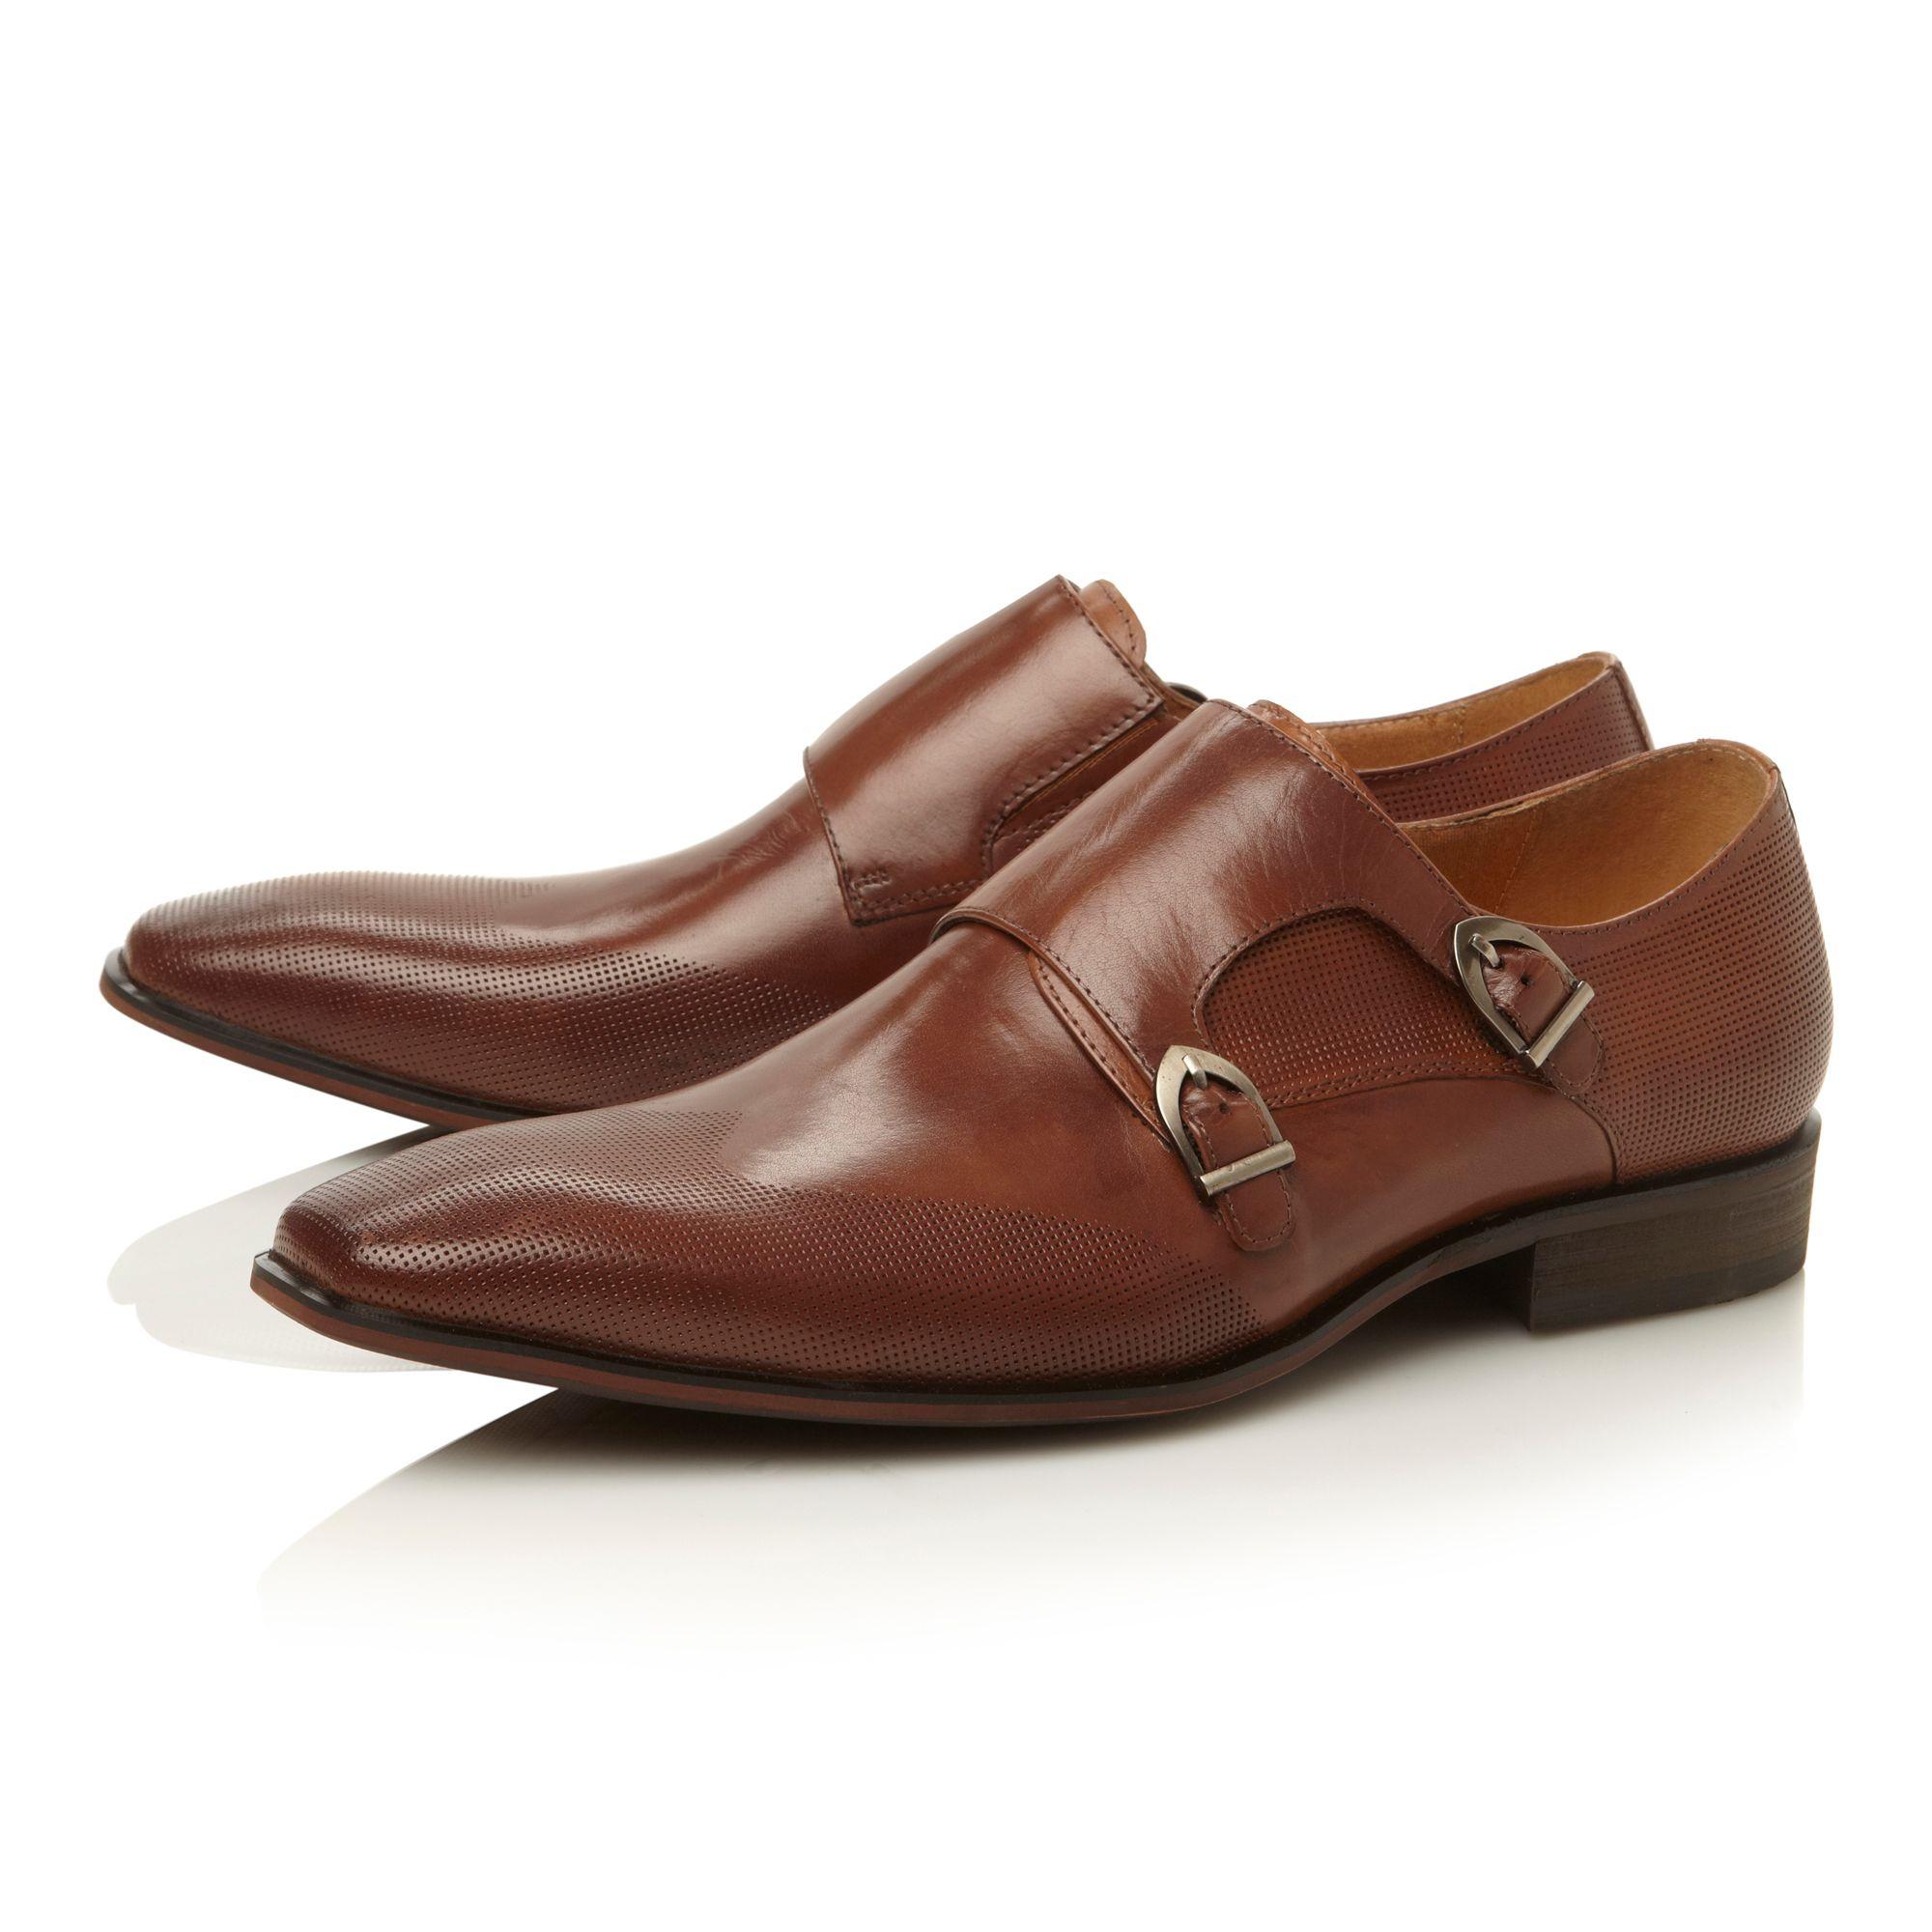 London Shoes Australia